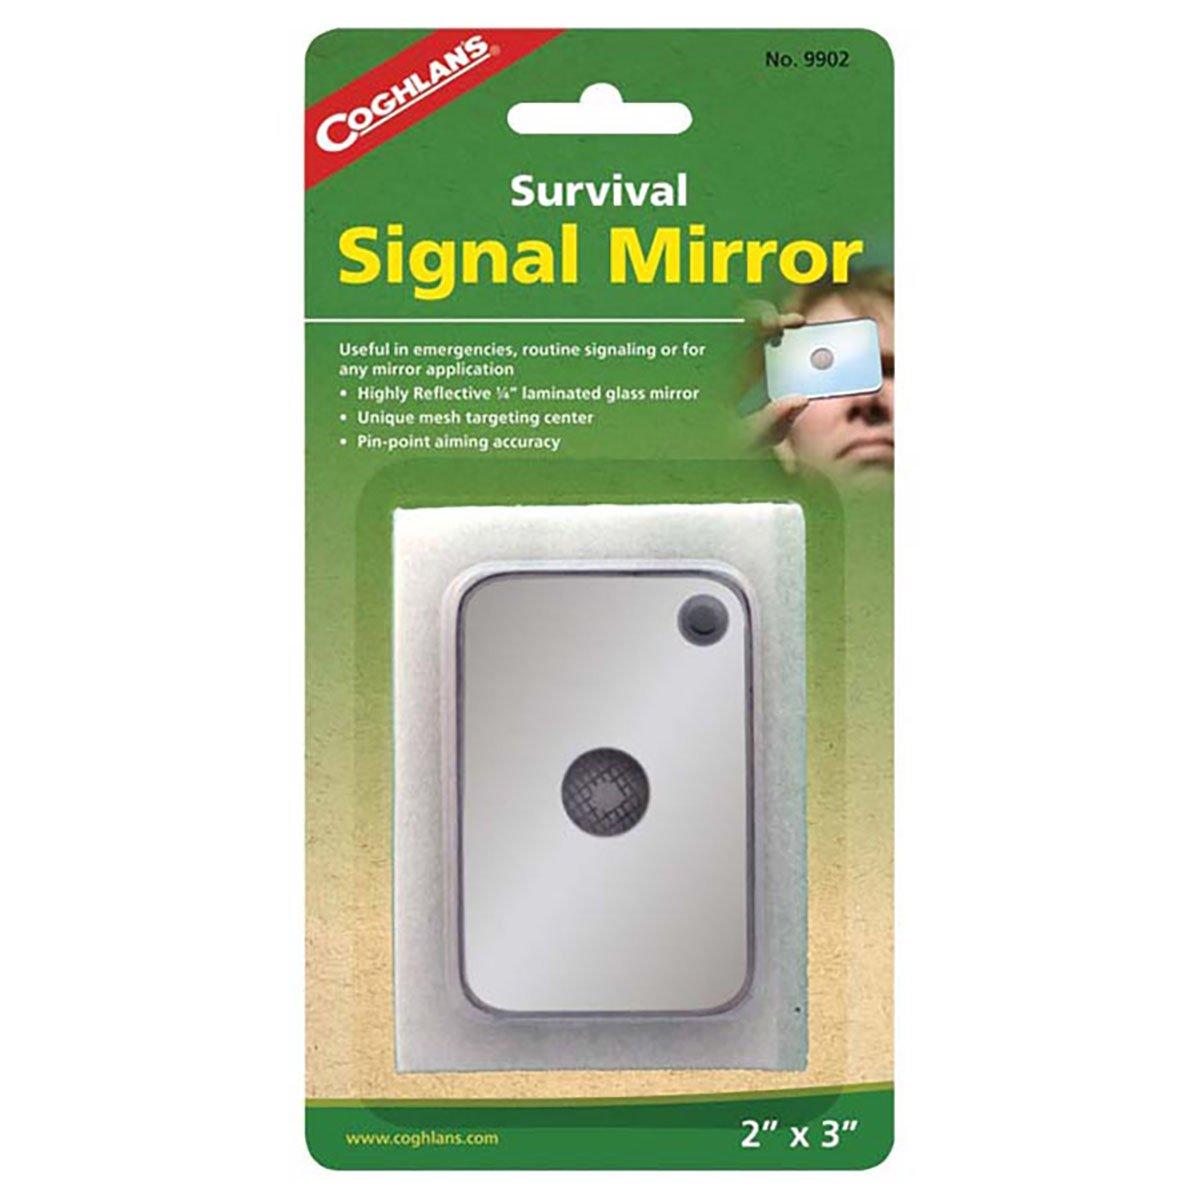 Coghlans Survival Signal Mirror